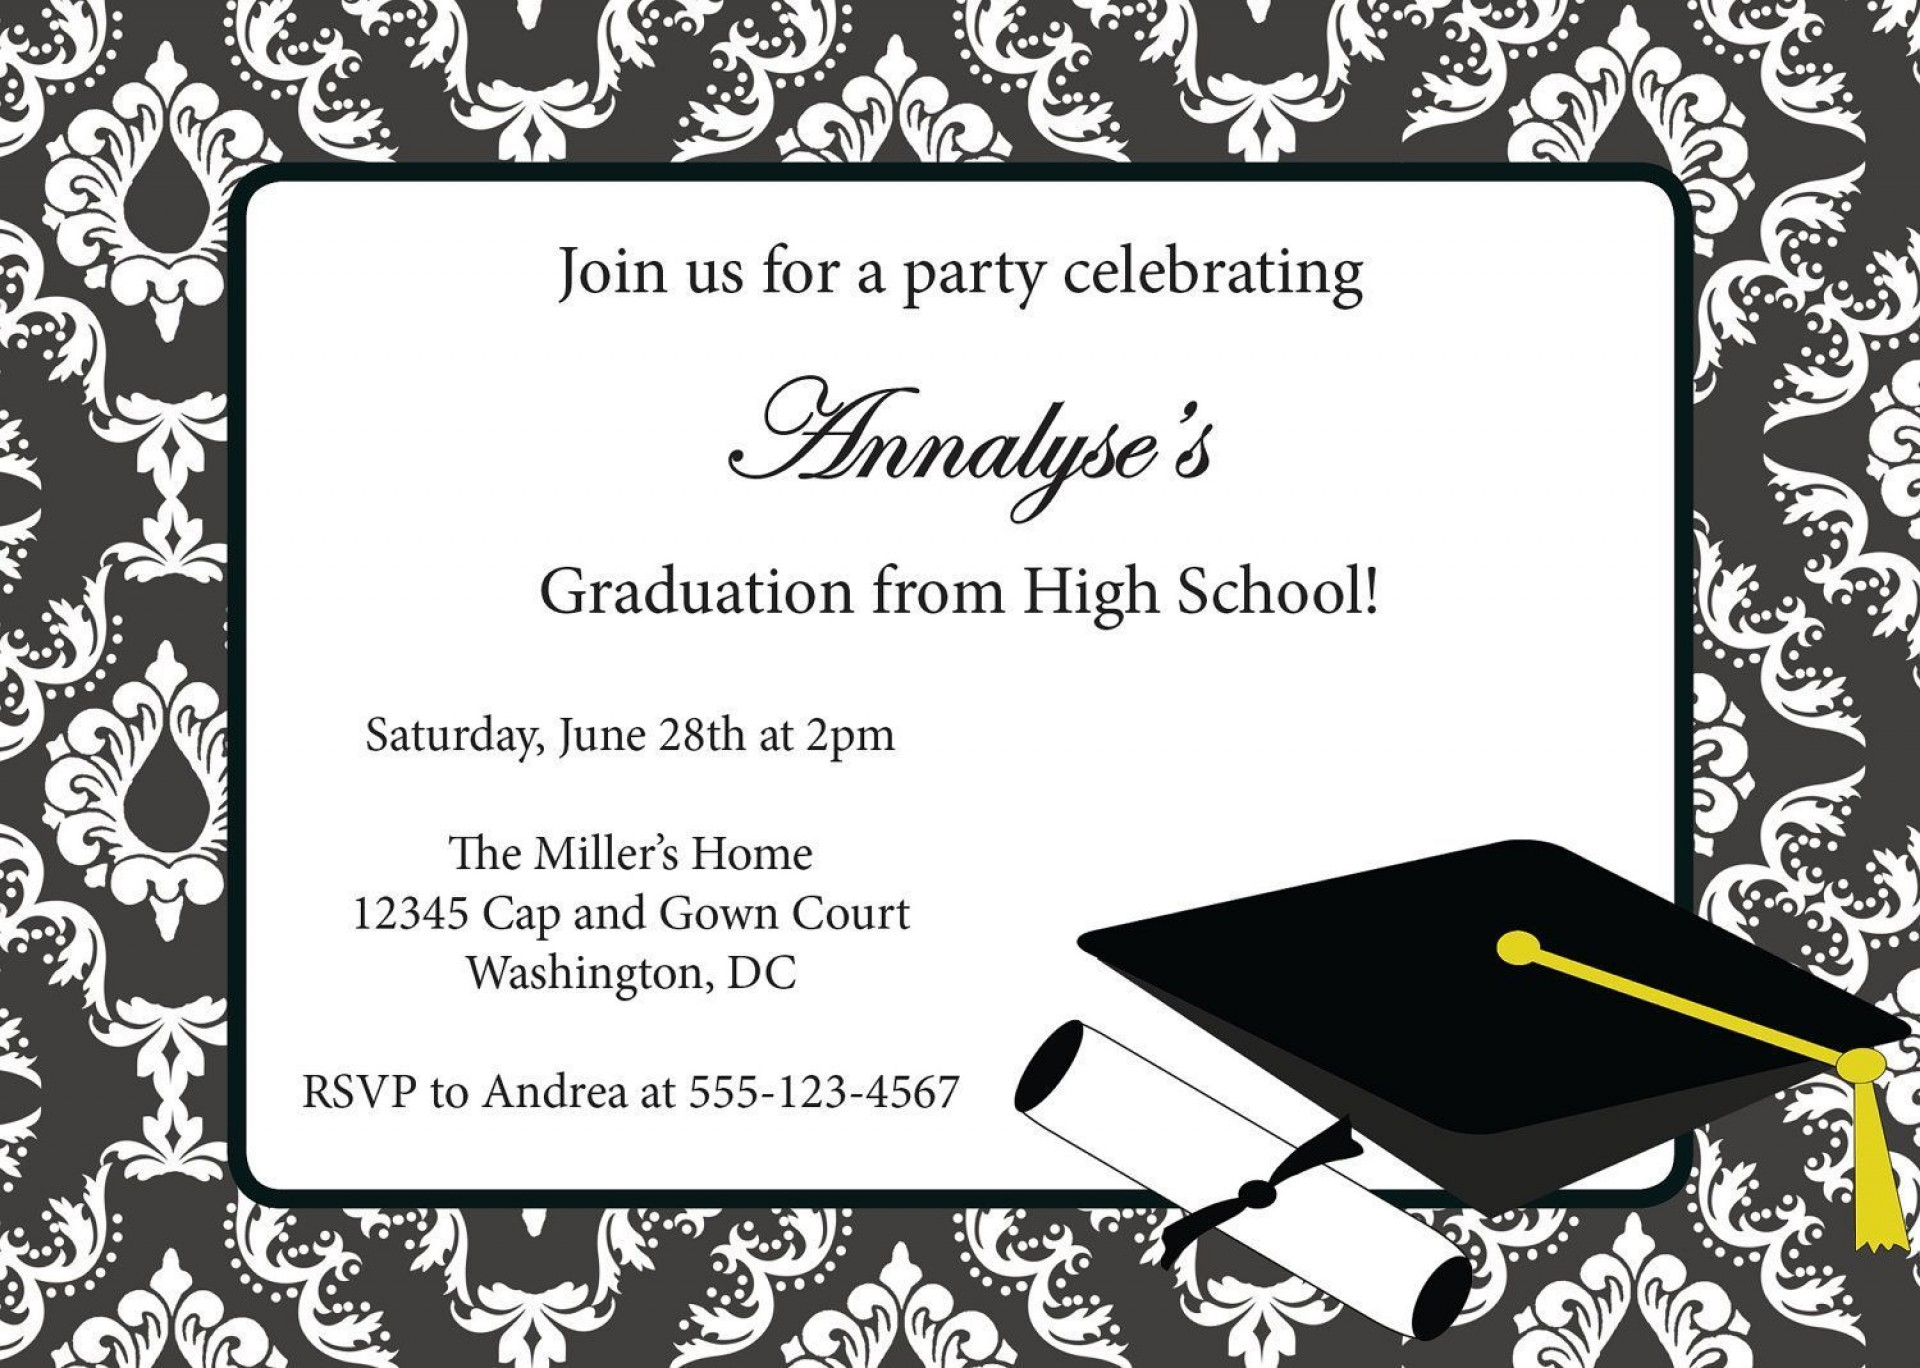 003 Stupendou Free Graduation Invitation Template Printable Picture  Kindergarten Party Card1920